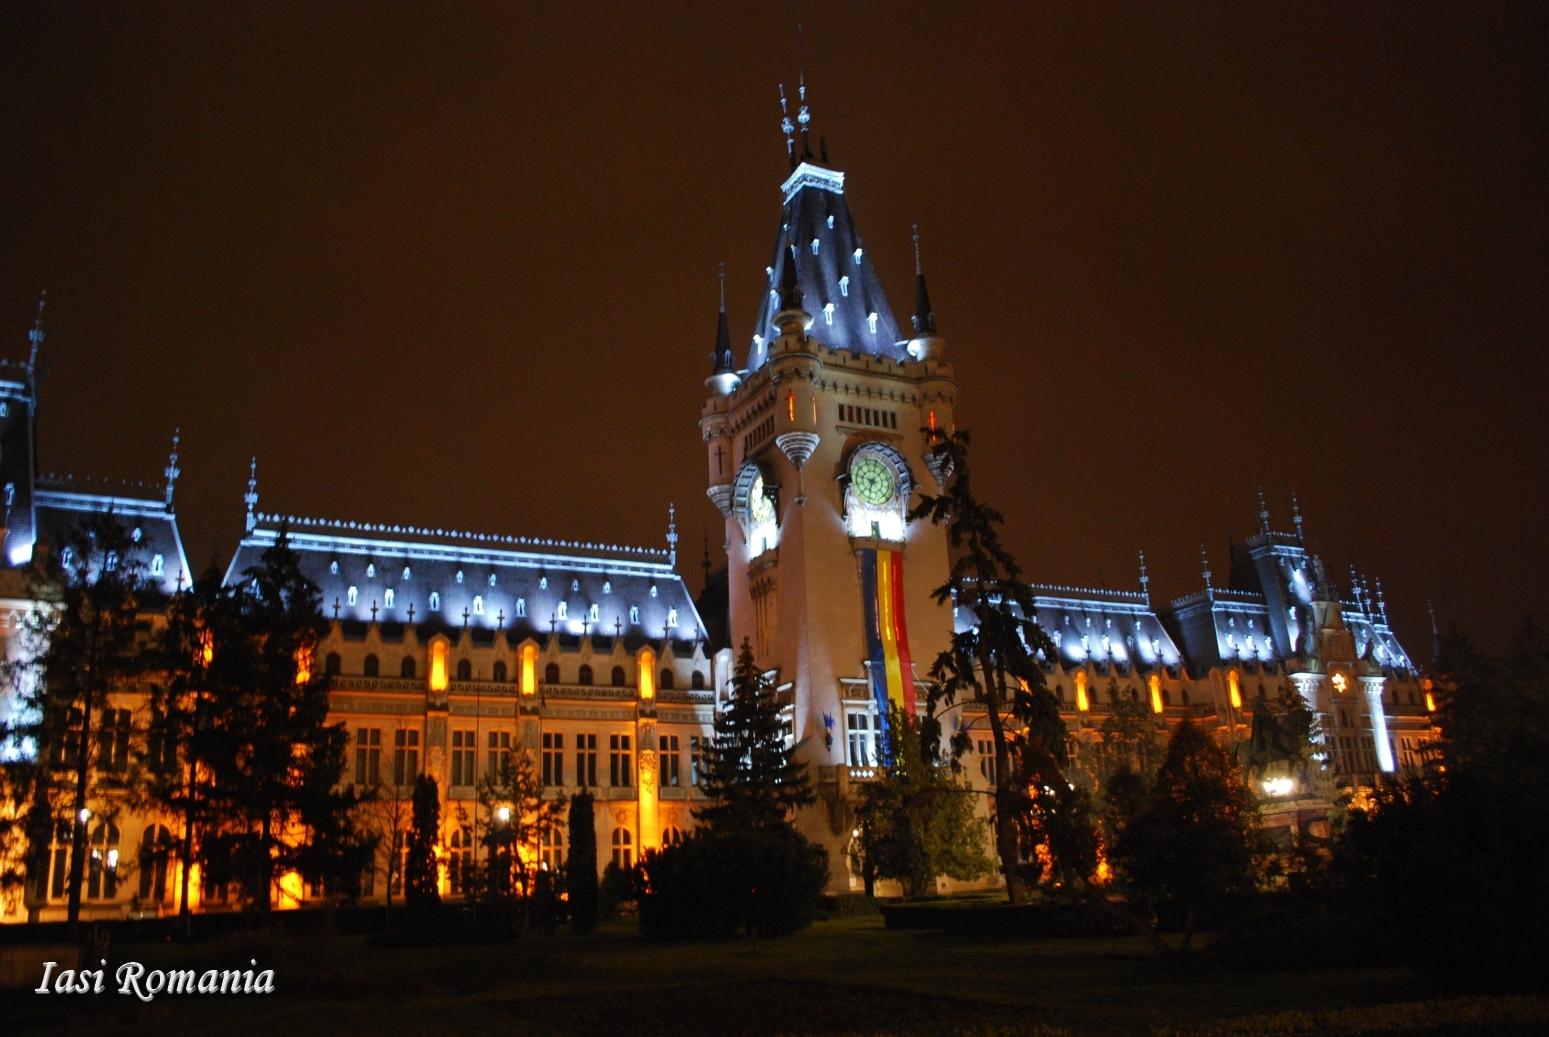 Iasi Romania  city pictures gallery : Romania images Iasi Romania Palace of Culture beautiful european ...